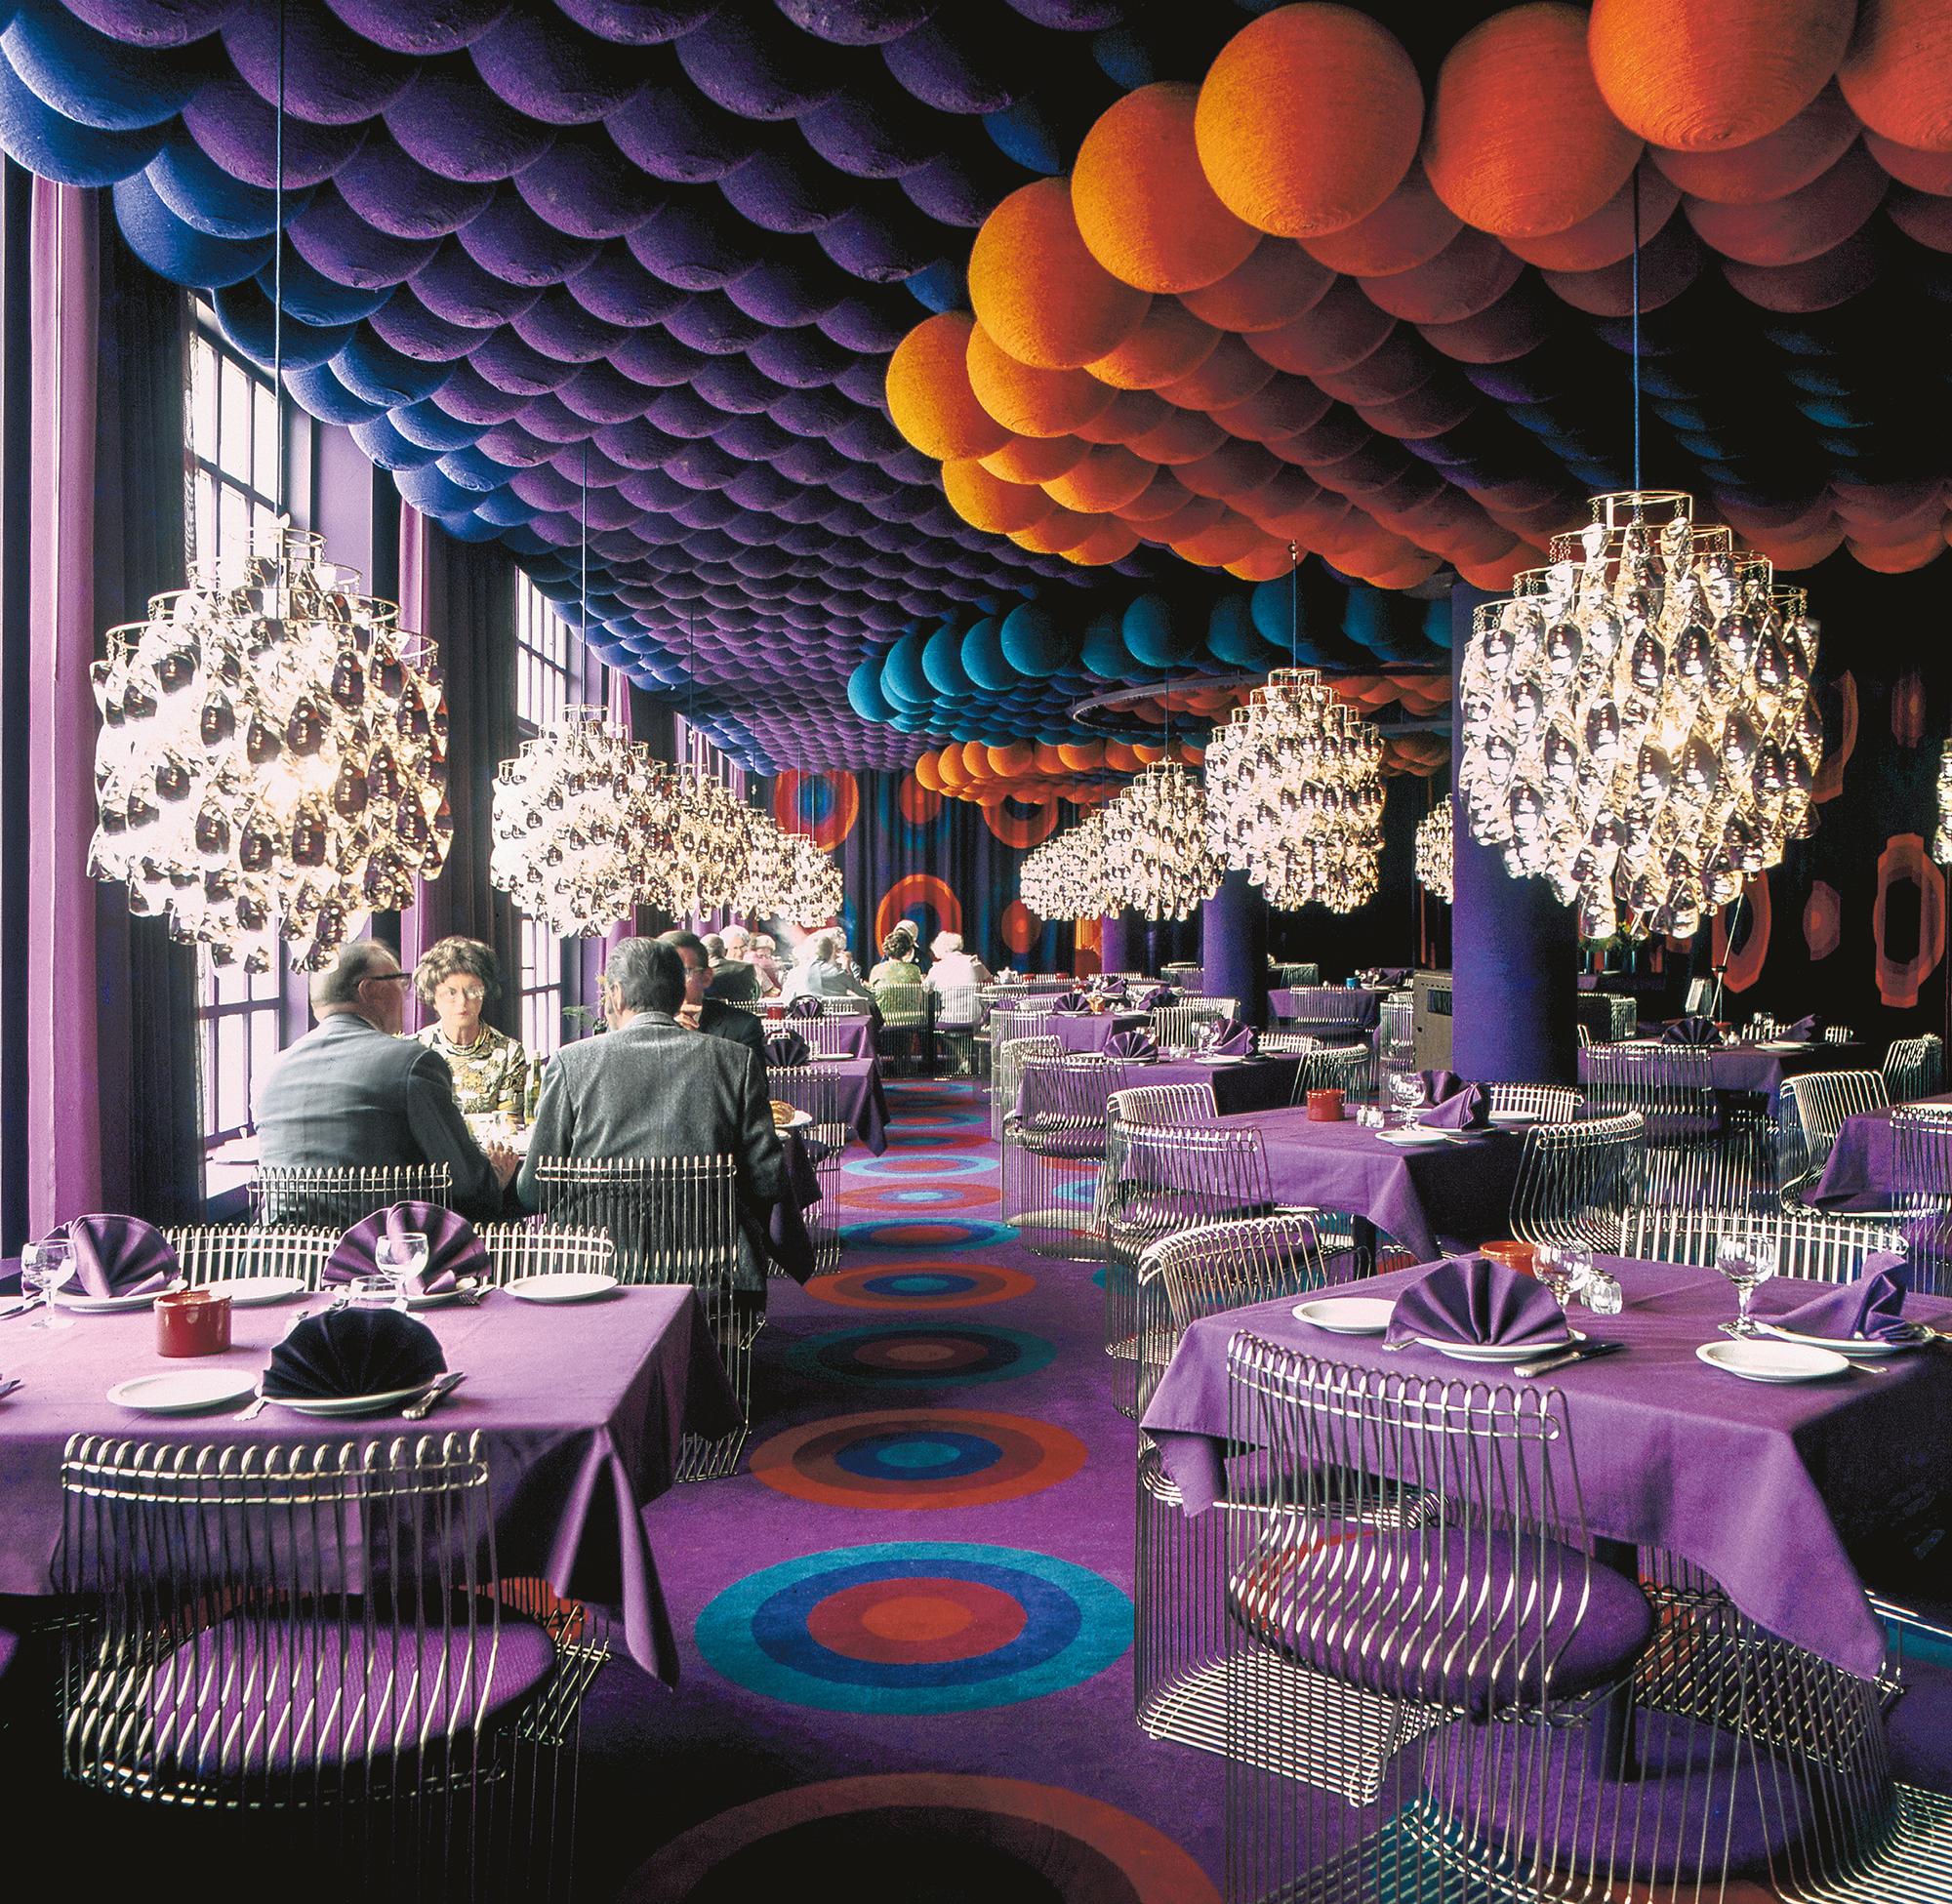 Inside the maximalist, kaleidoscopic interiors of Verner Panton